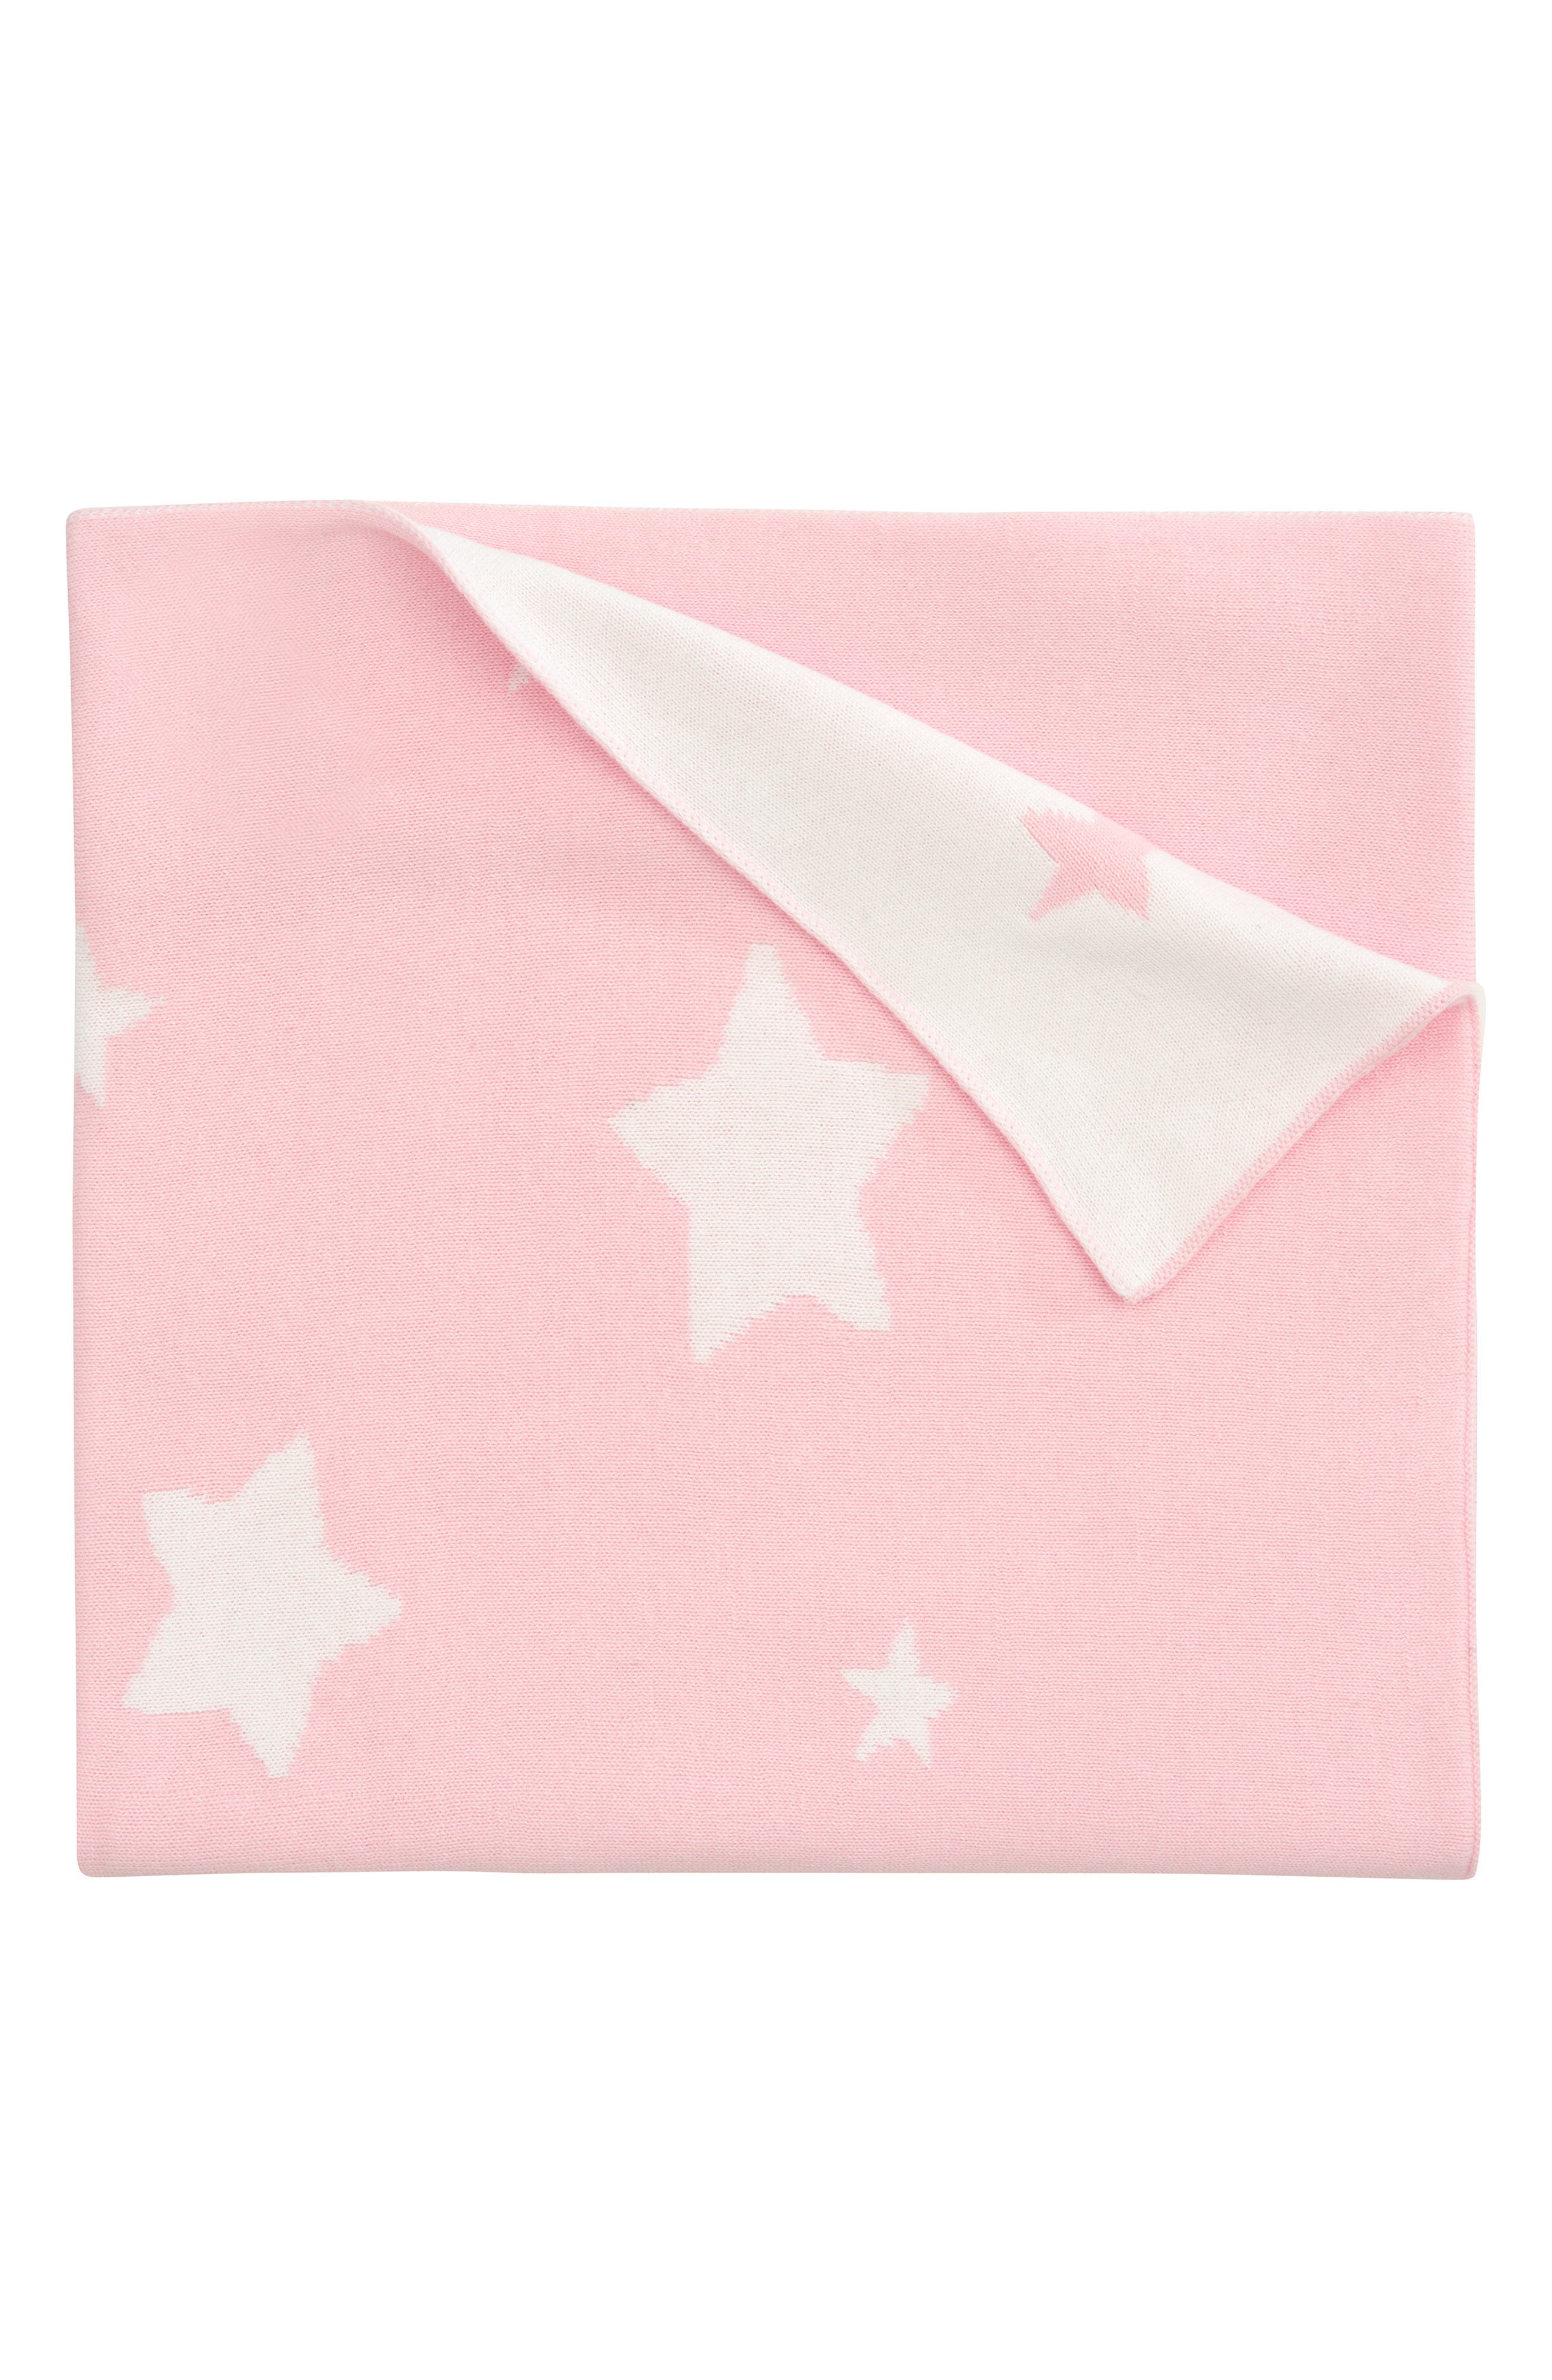 Alternate Image 1 Selected - Elegant Baby 'Star' Knit Blanket